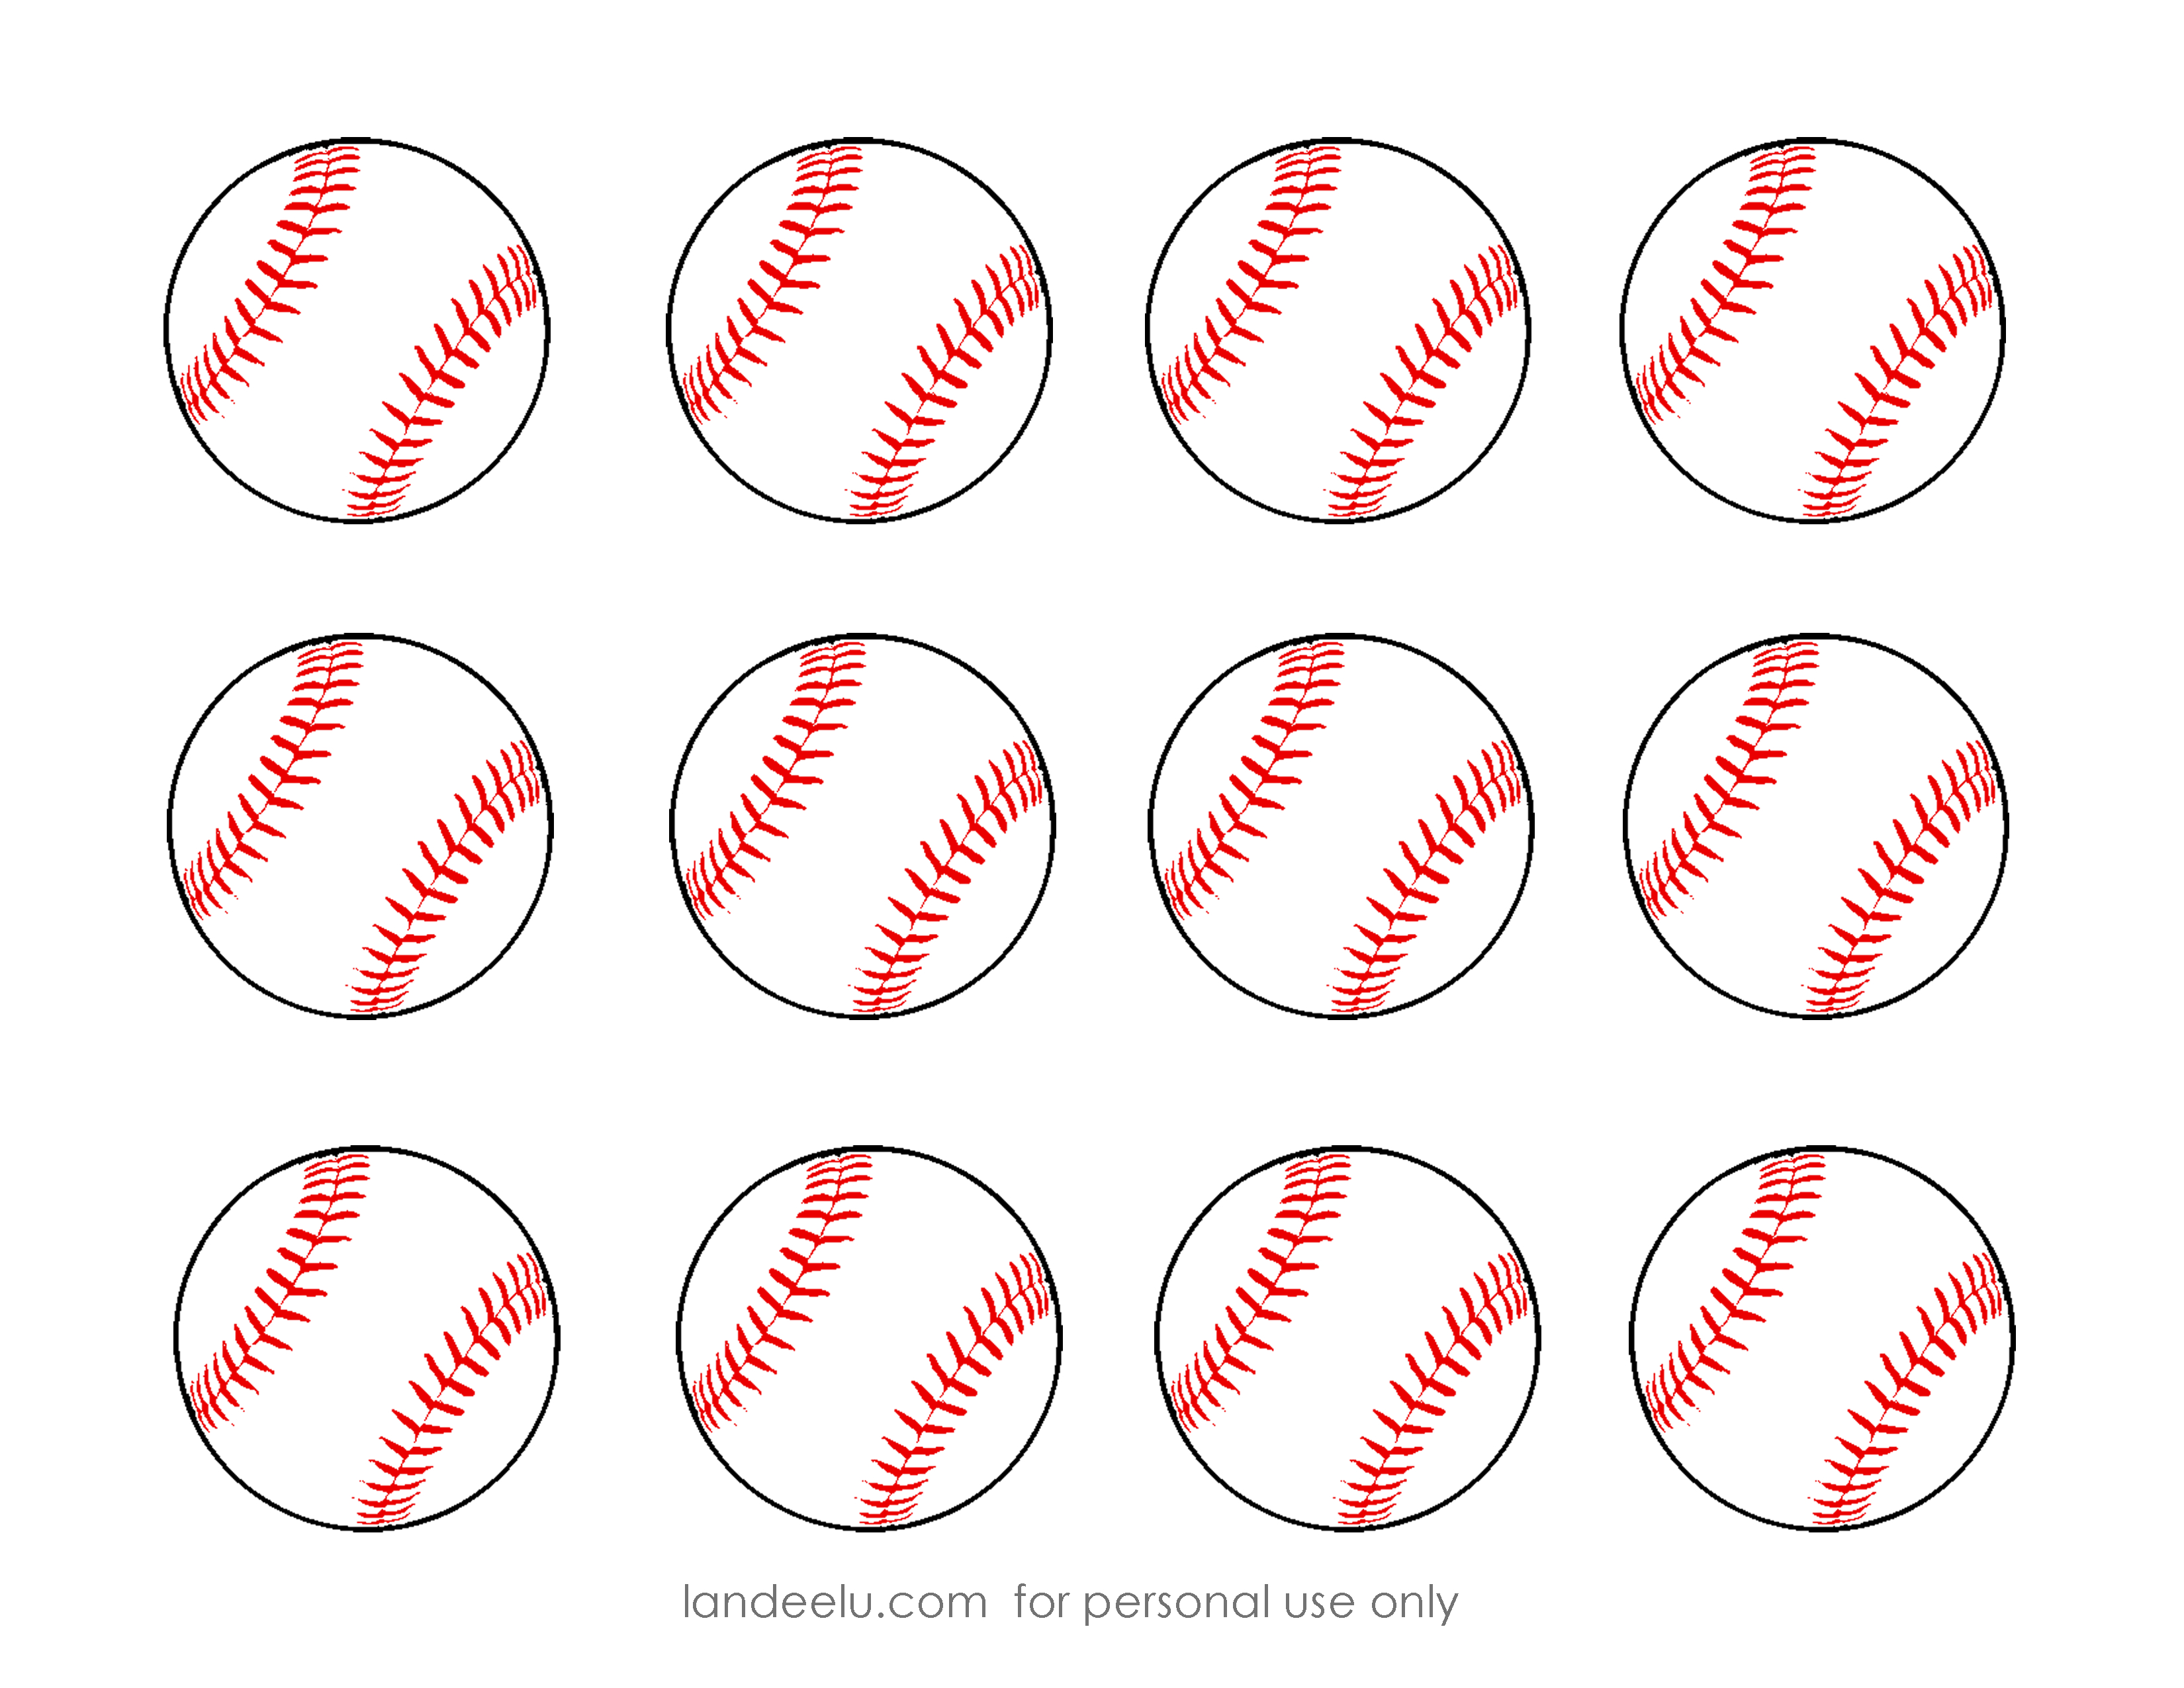 Free Printable Baseball Clip Art Images | Inch Circle Punch Or - Free Printable Baseball Logos